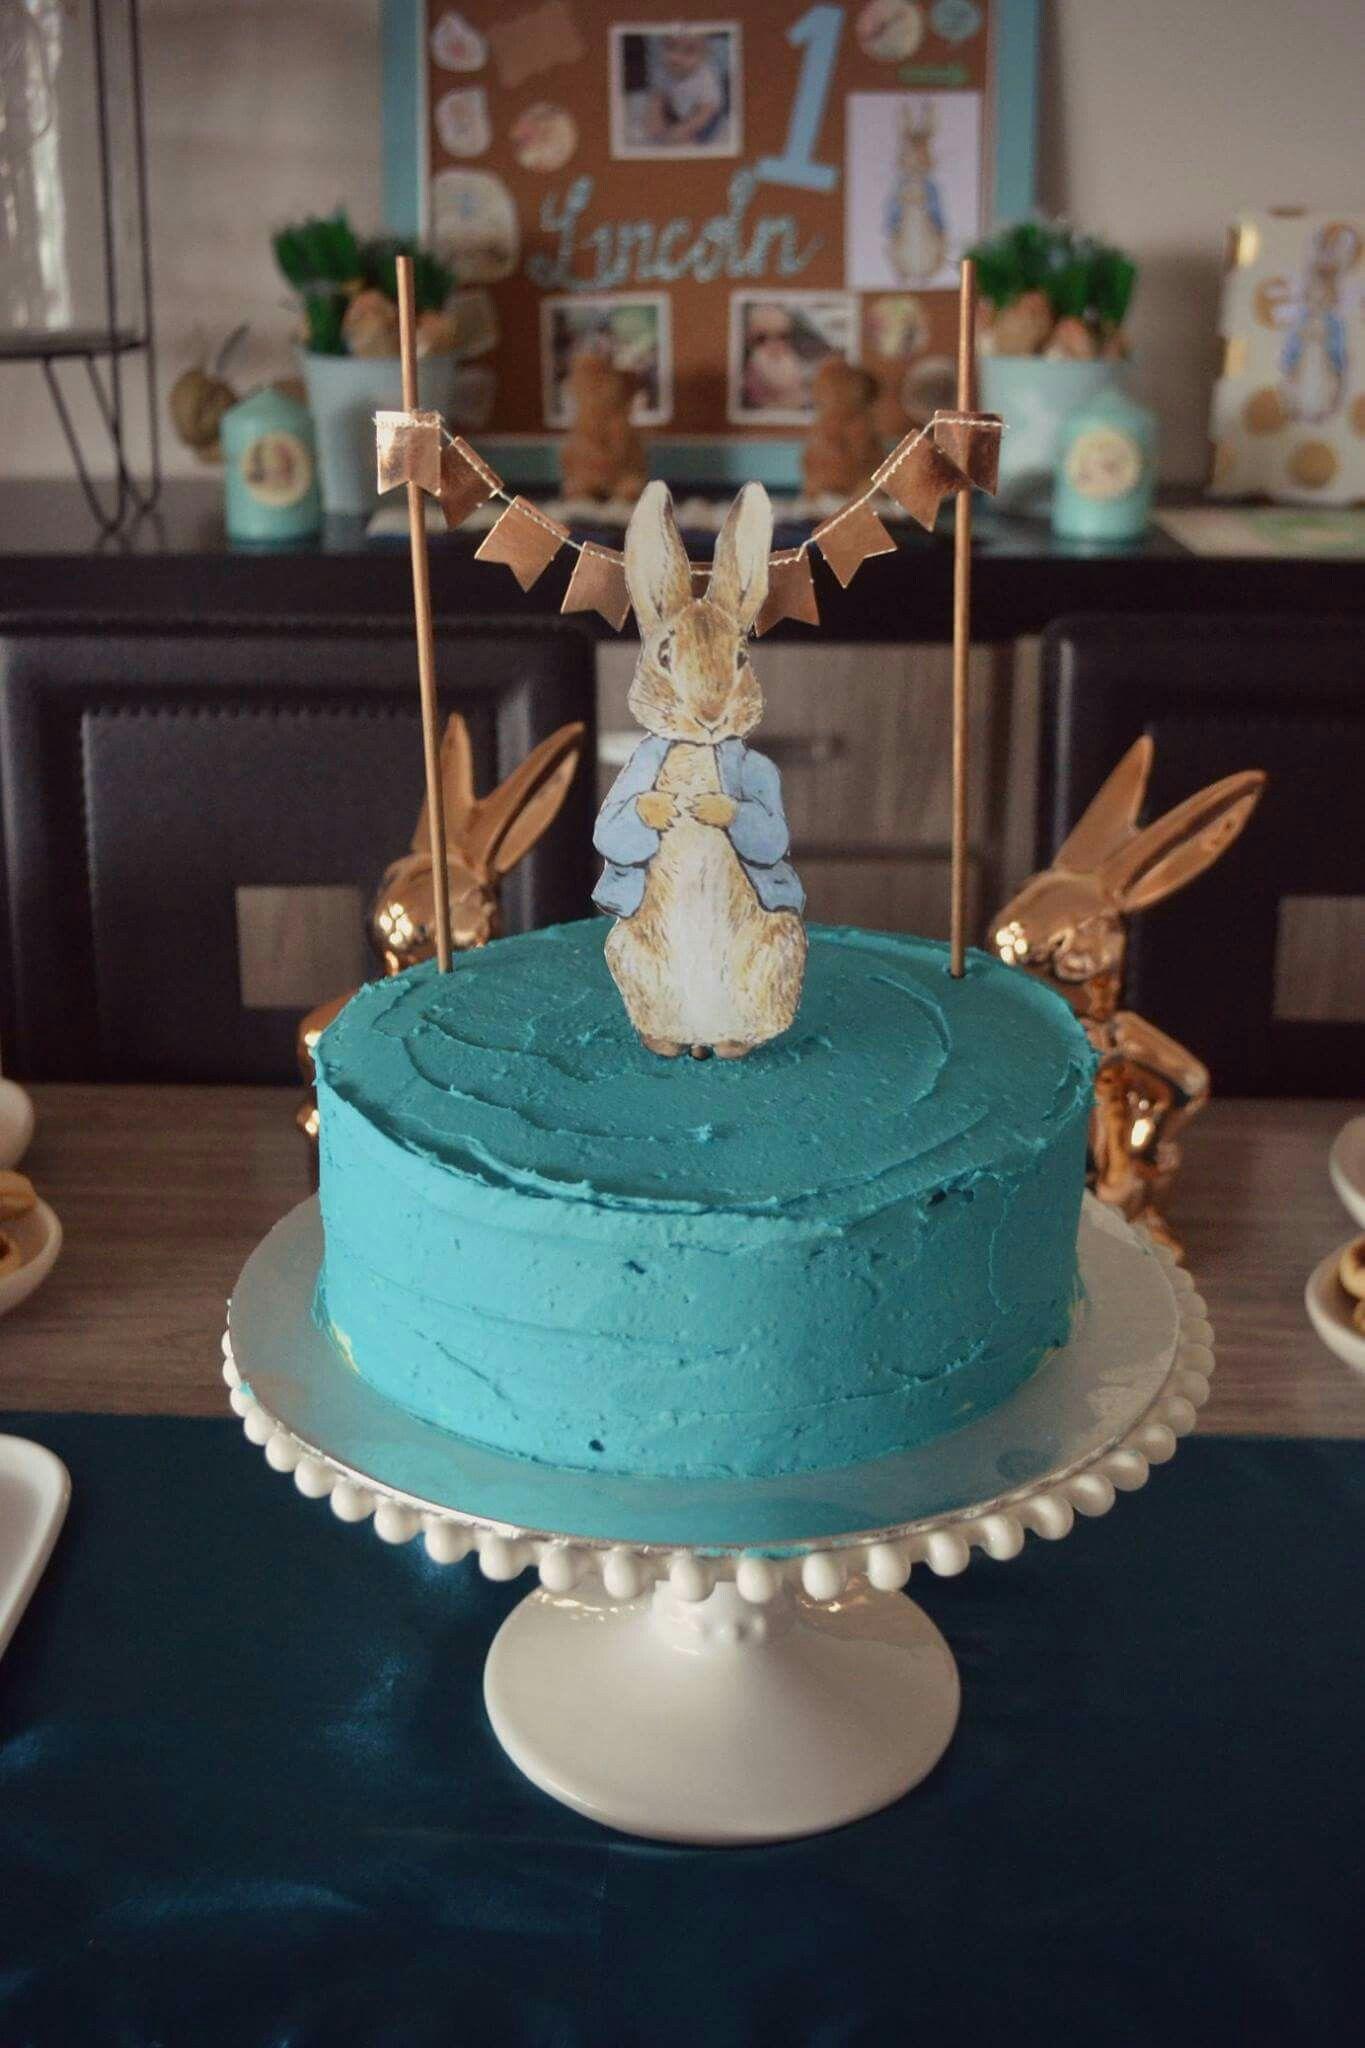 Peter Rabbit Cake Orange And Poppyseed With Blue Wilton